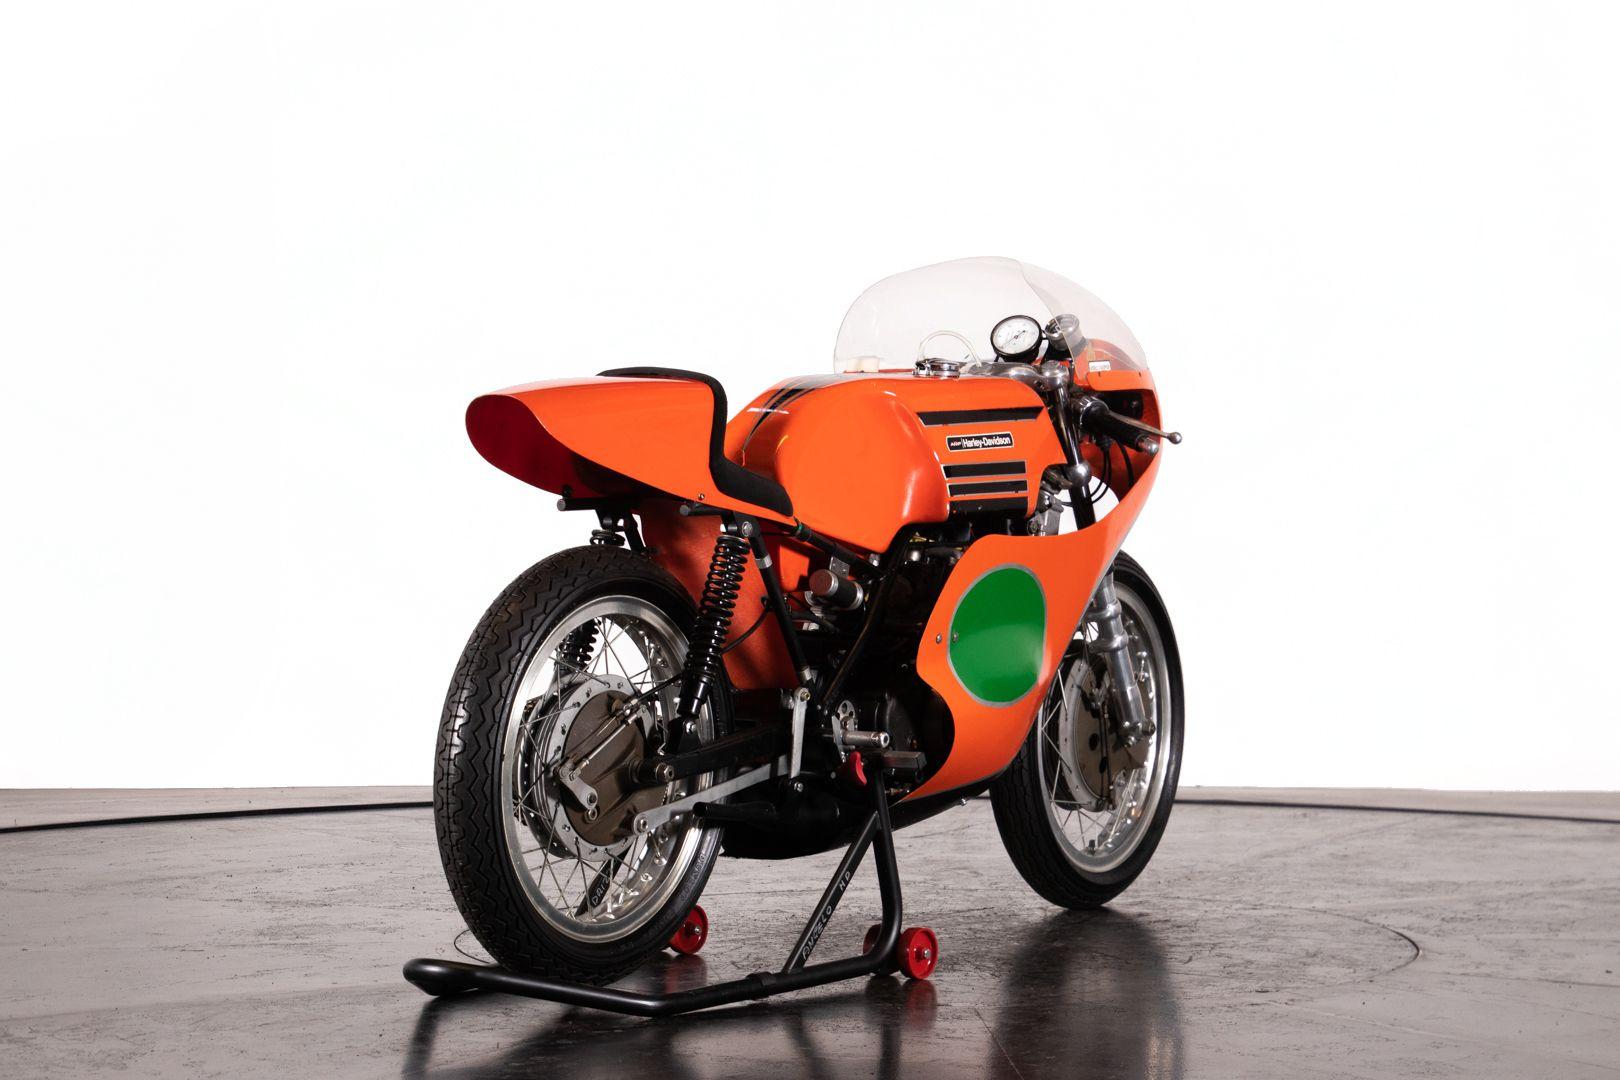 1974 HARLEY DAVIDSON 250 RR 51556